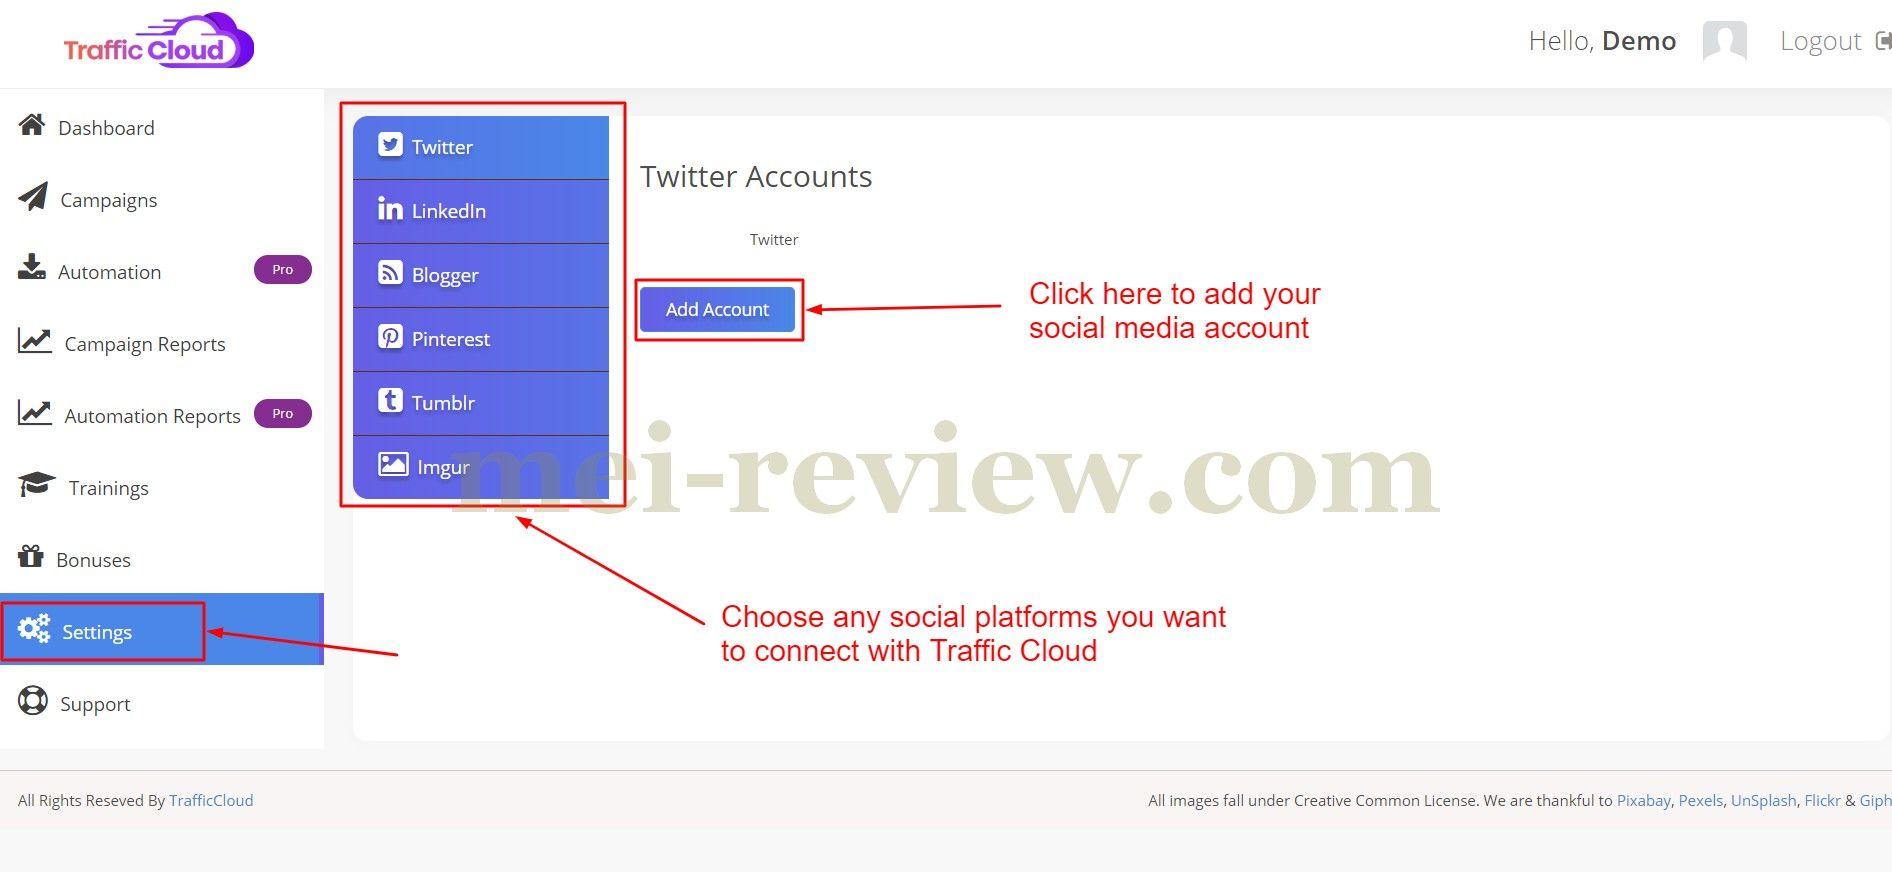 Traffic-Cloud-Demo-2